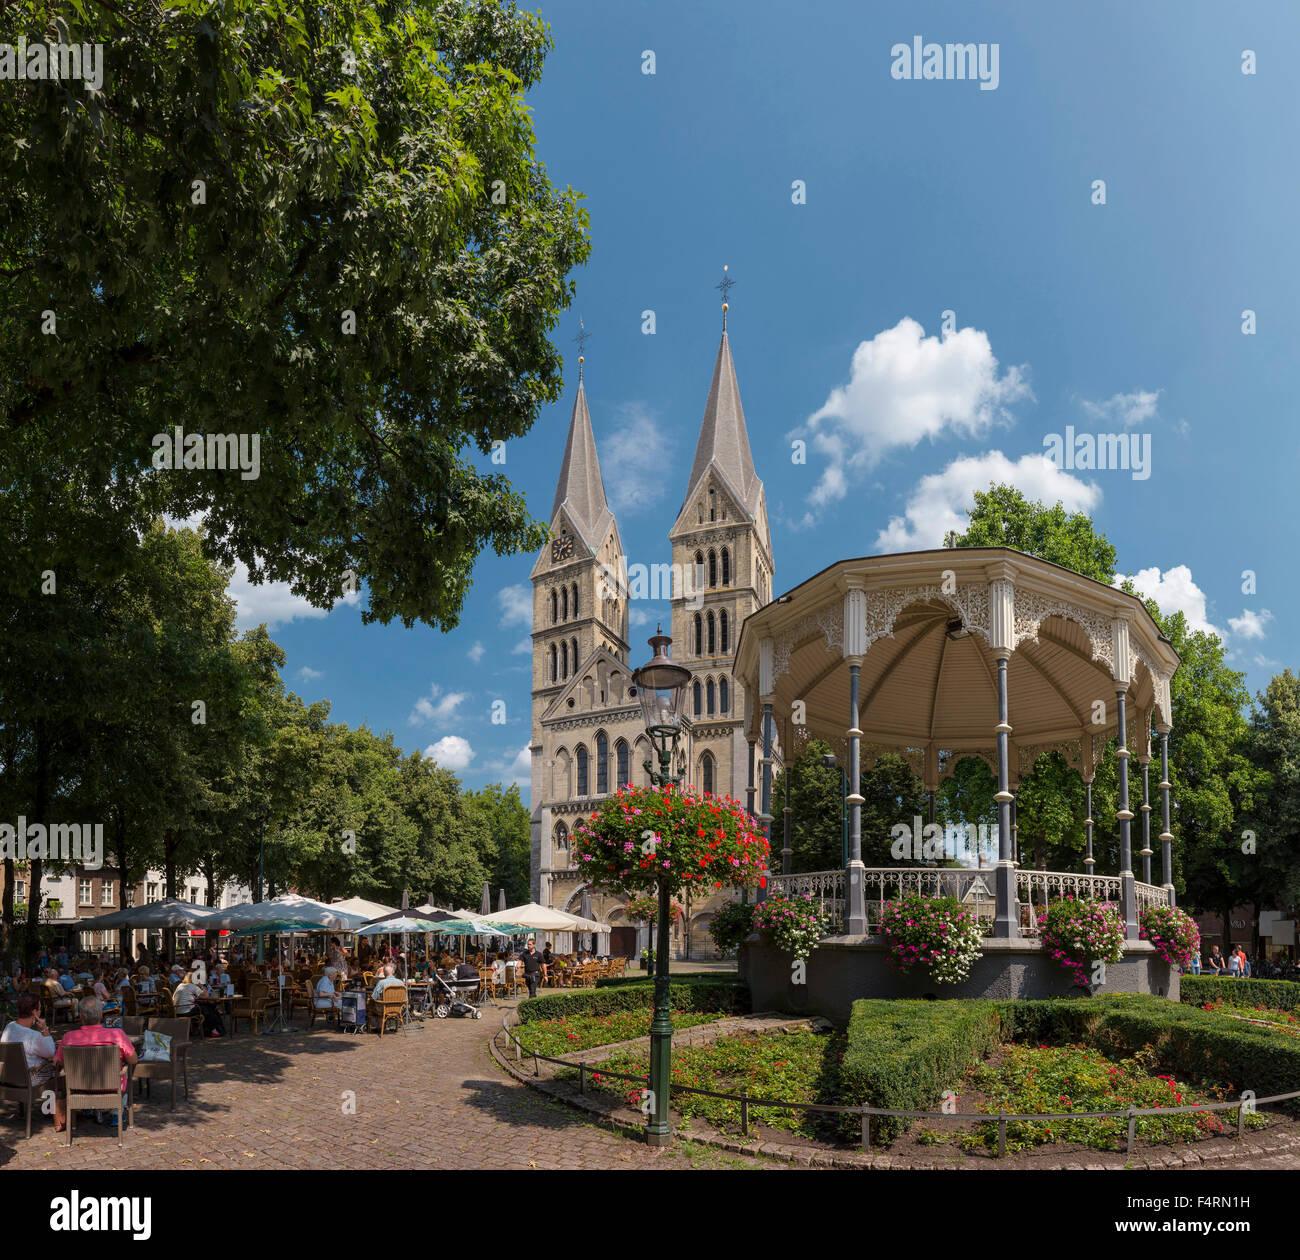 niederlande europa holland roermond limburg kirche kloster wald holz b ume sommer. Black Bedroom Furniture Sets. Home Design Ideas